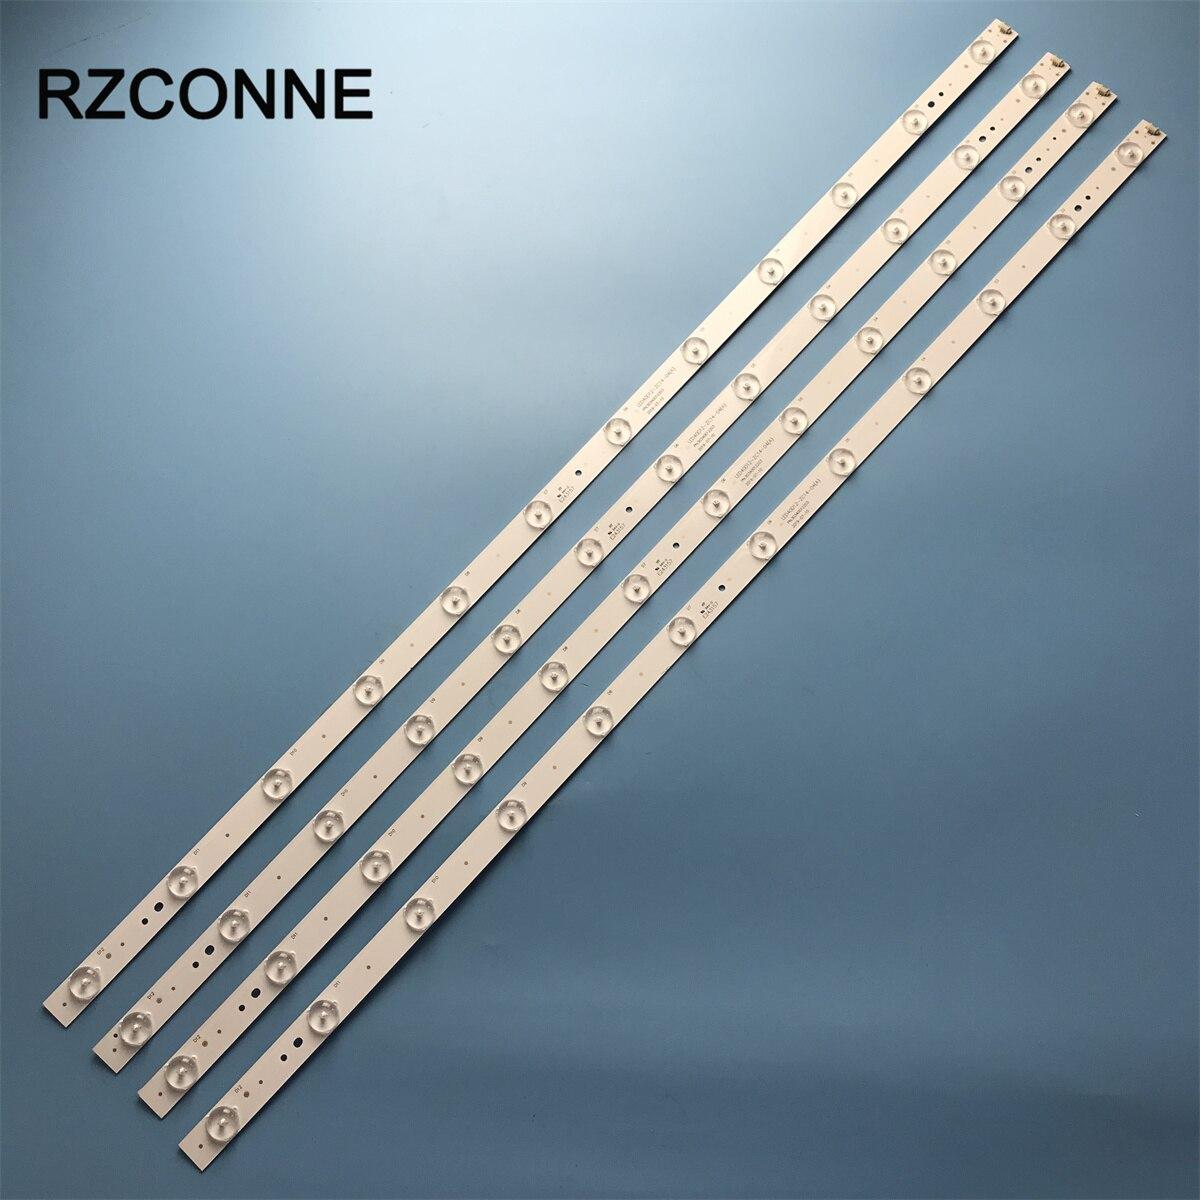 LED شريط إضاءة خلفي مصباح ل LED40D12-ZC14-04 (أ) LED40D12-01 V400HJ2-PE1 LE40A7100L LE40B3300W LE40B3000 LED40ME1000